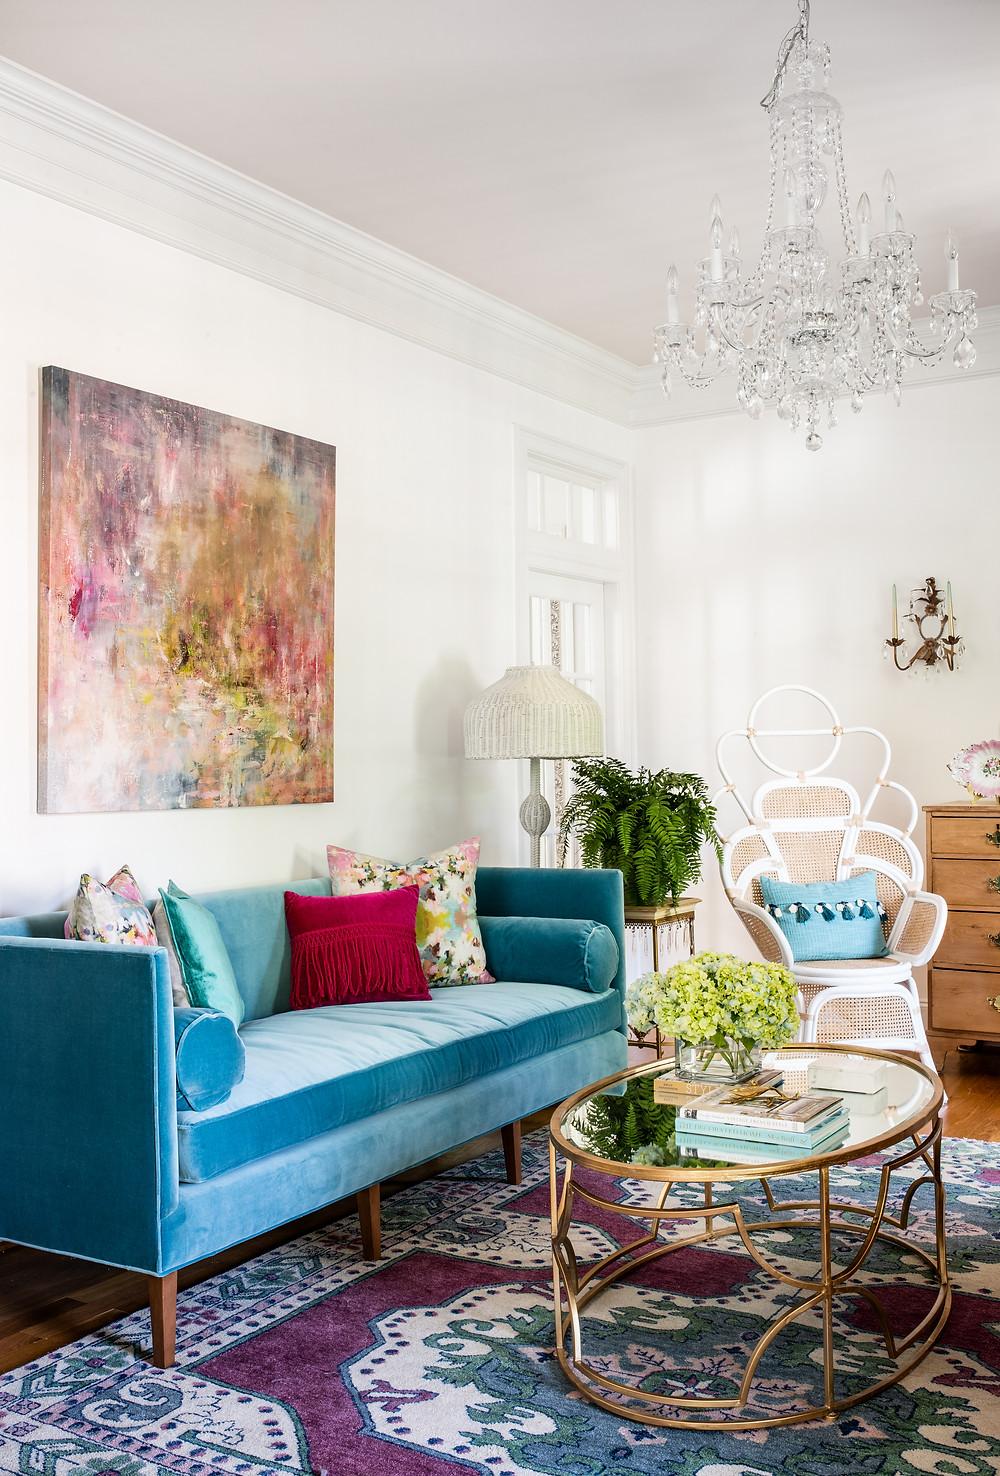 Mary Hannah Interiors Blog Elegant Retrohemian Chateau: Home Tour, Formal Living Room